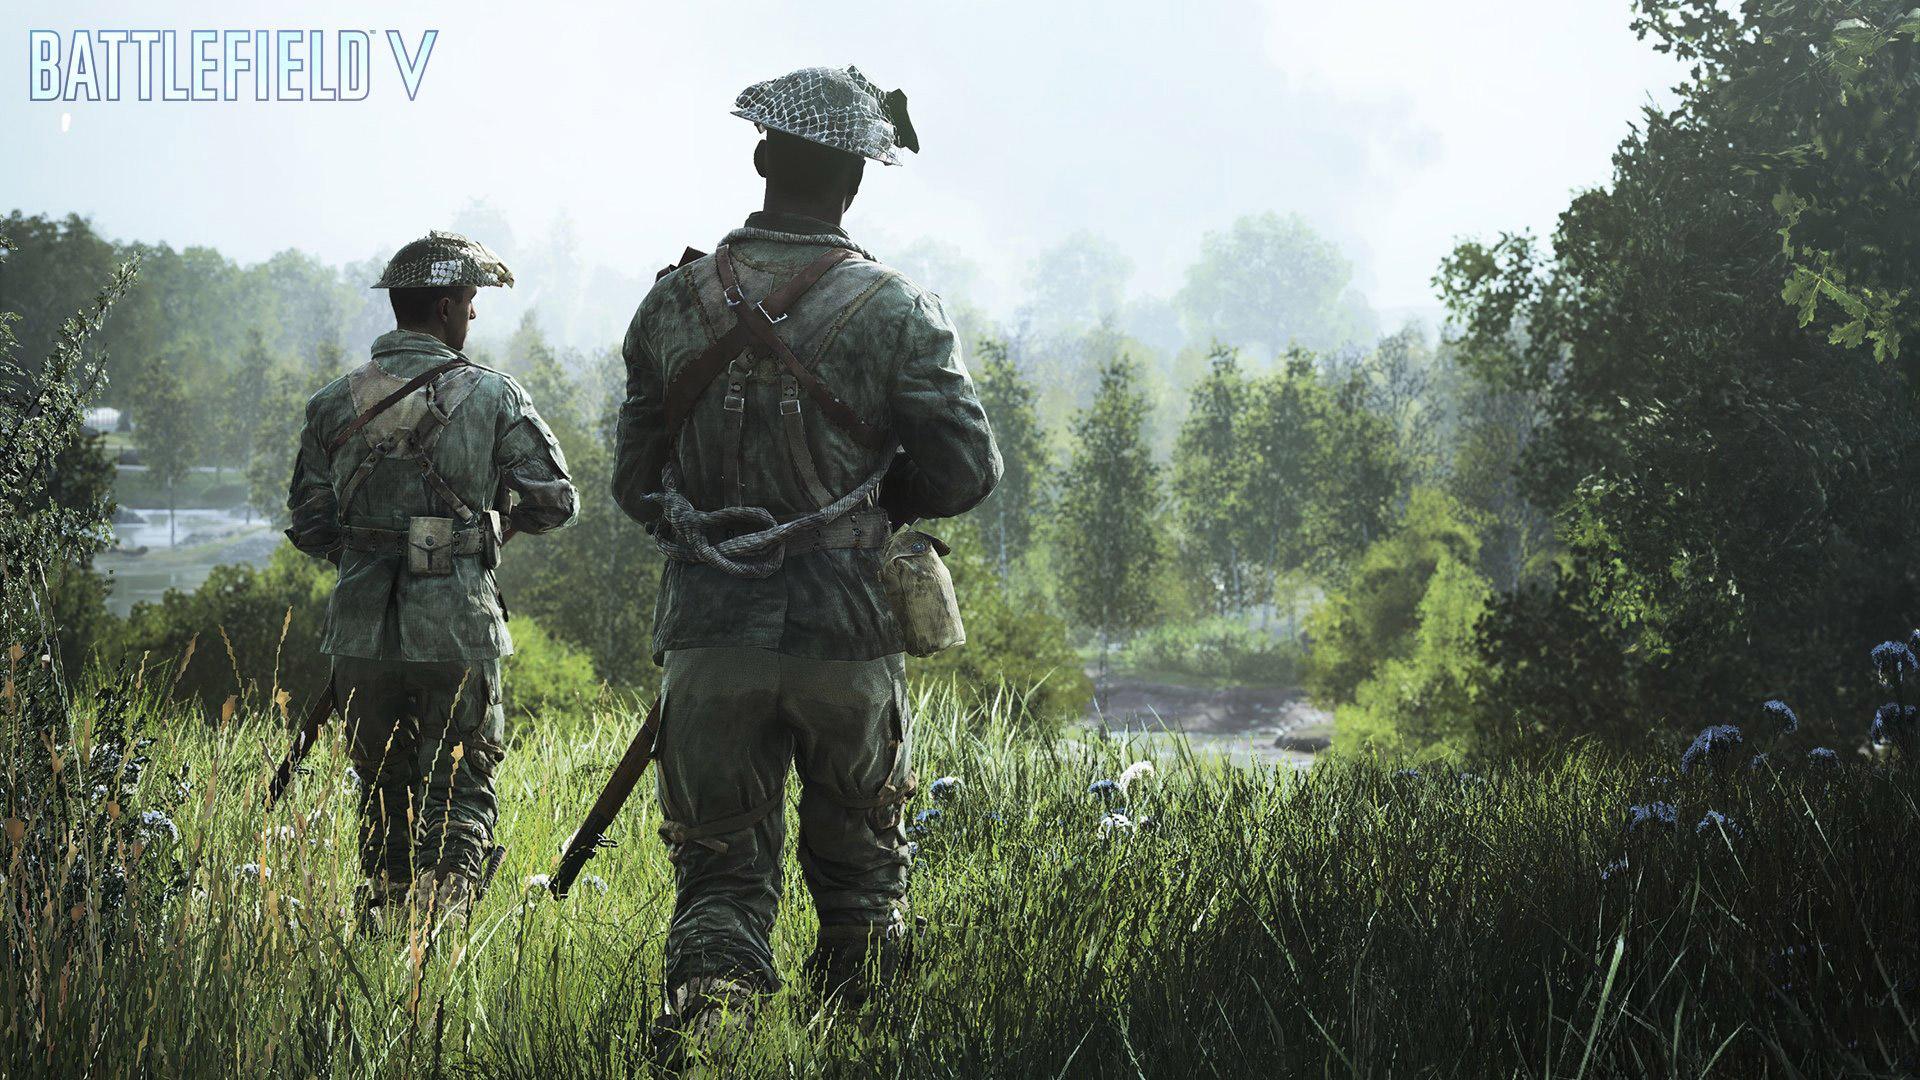 Free Battlefield V Wallpaper in 1920x1080